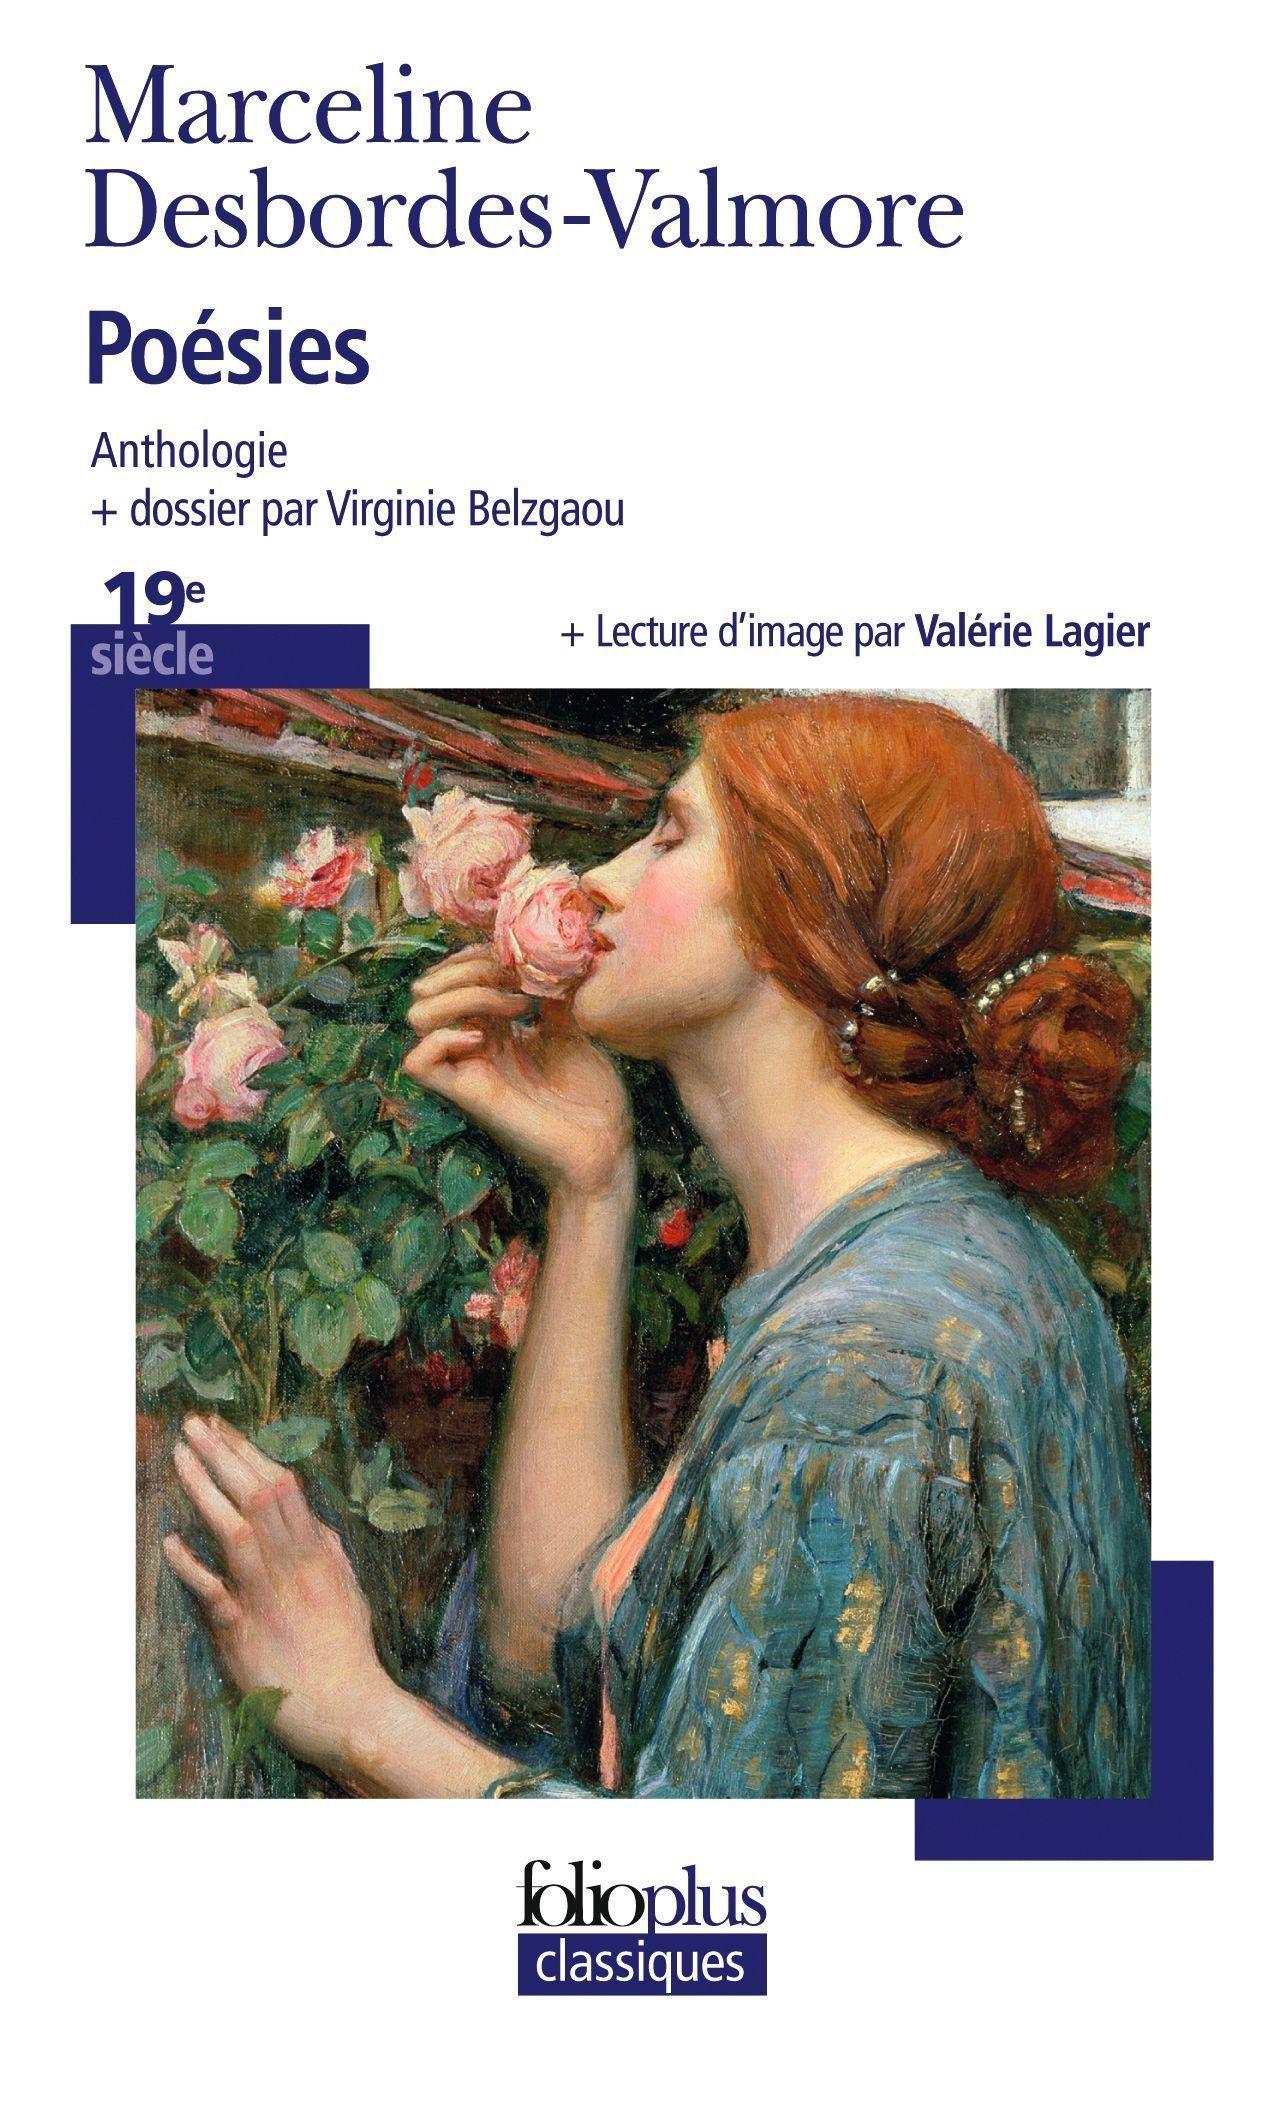 Marceline Desbordes-Valmore, Poésies.